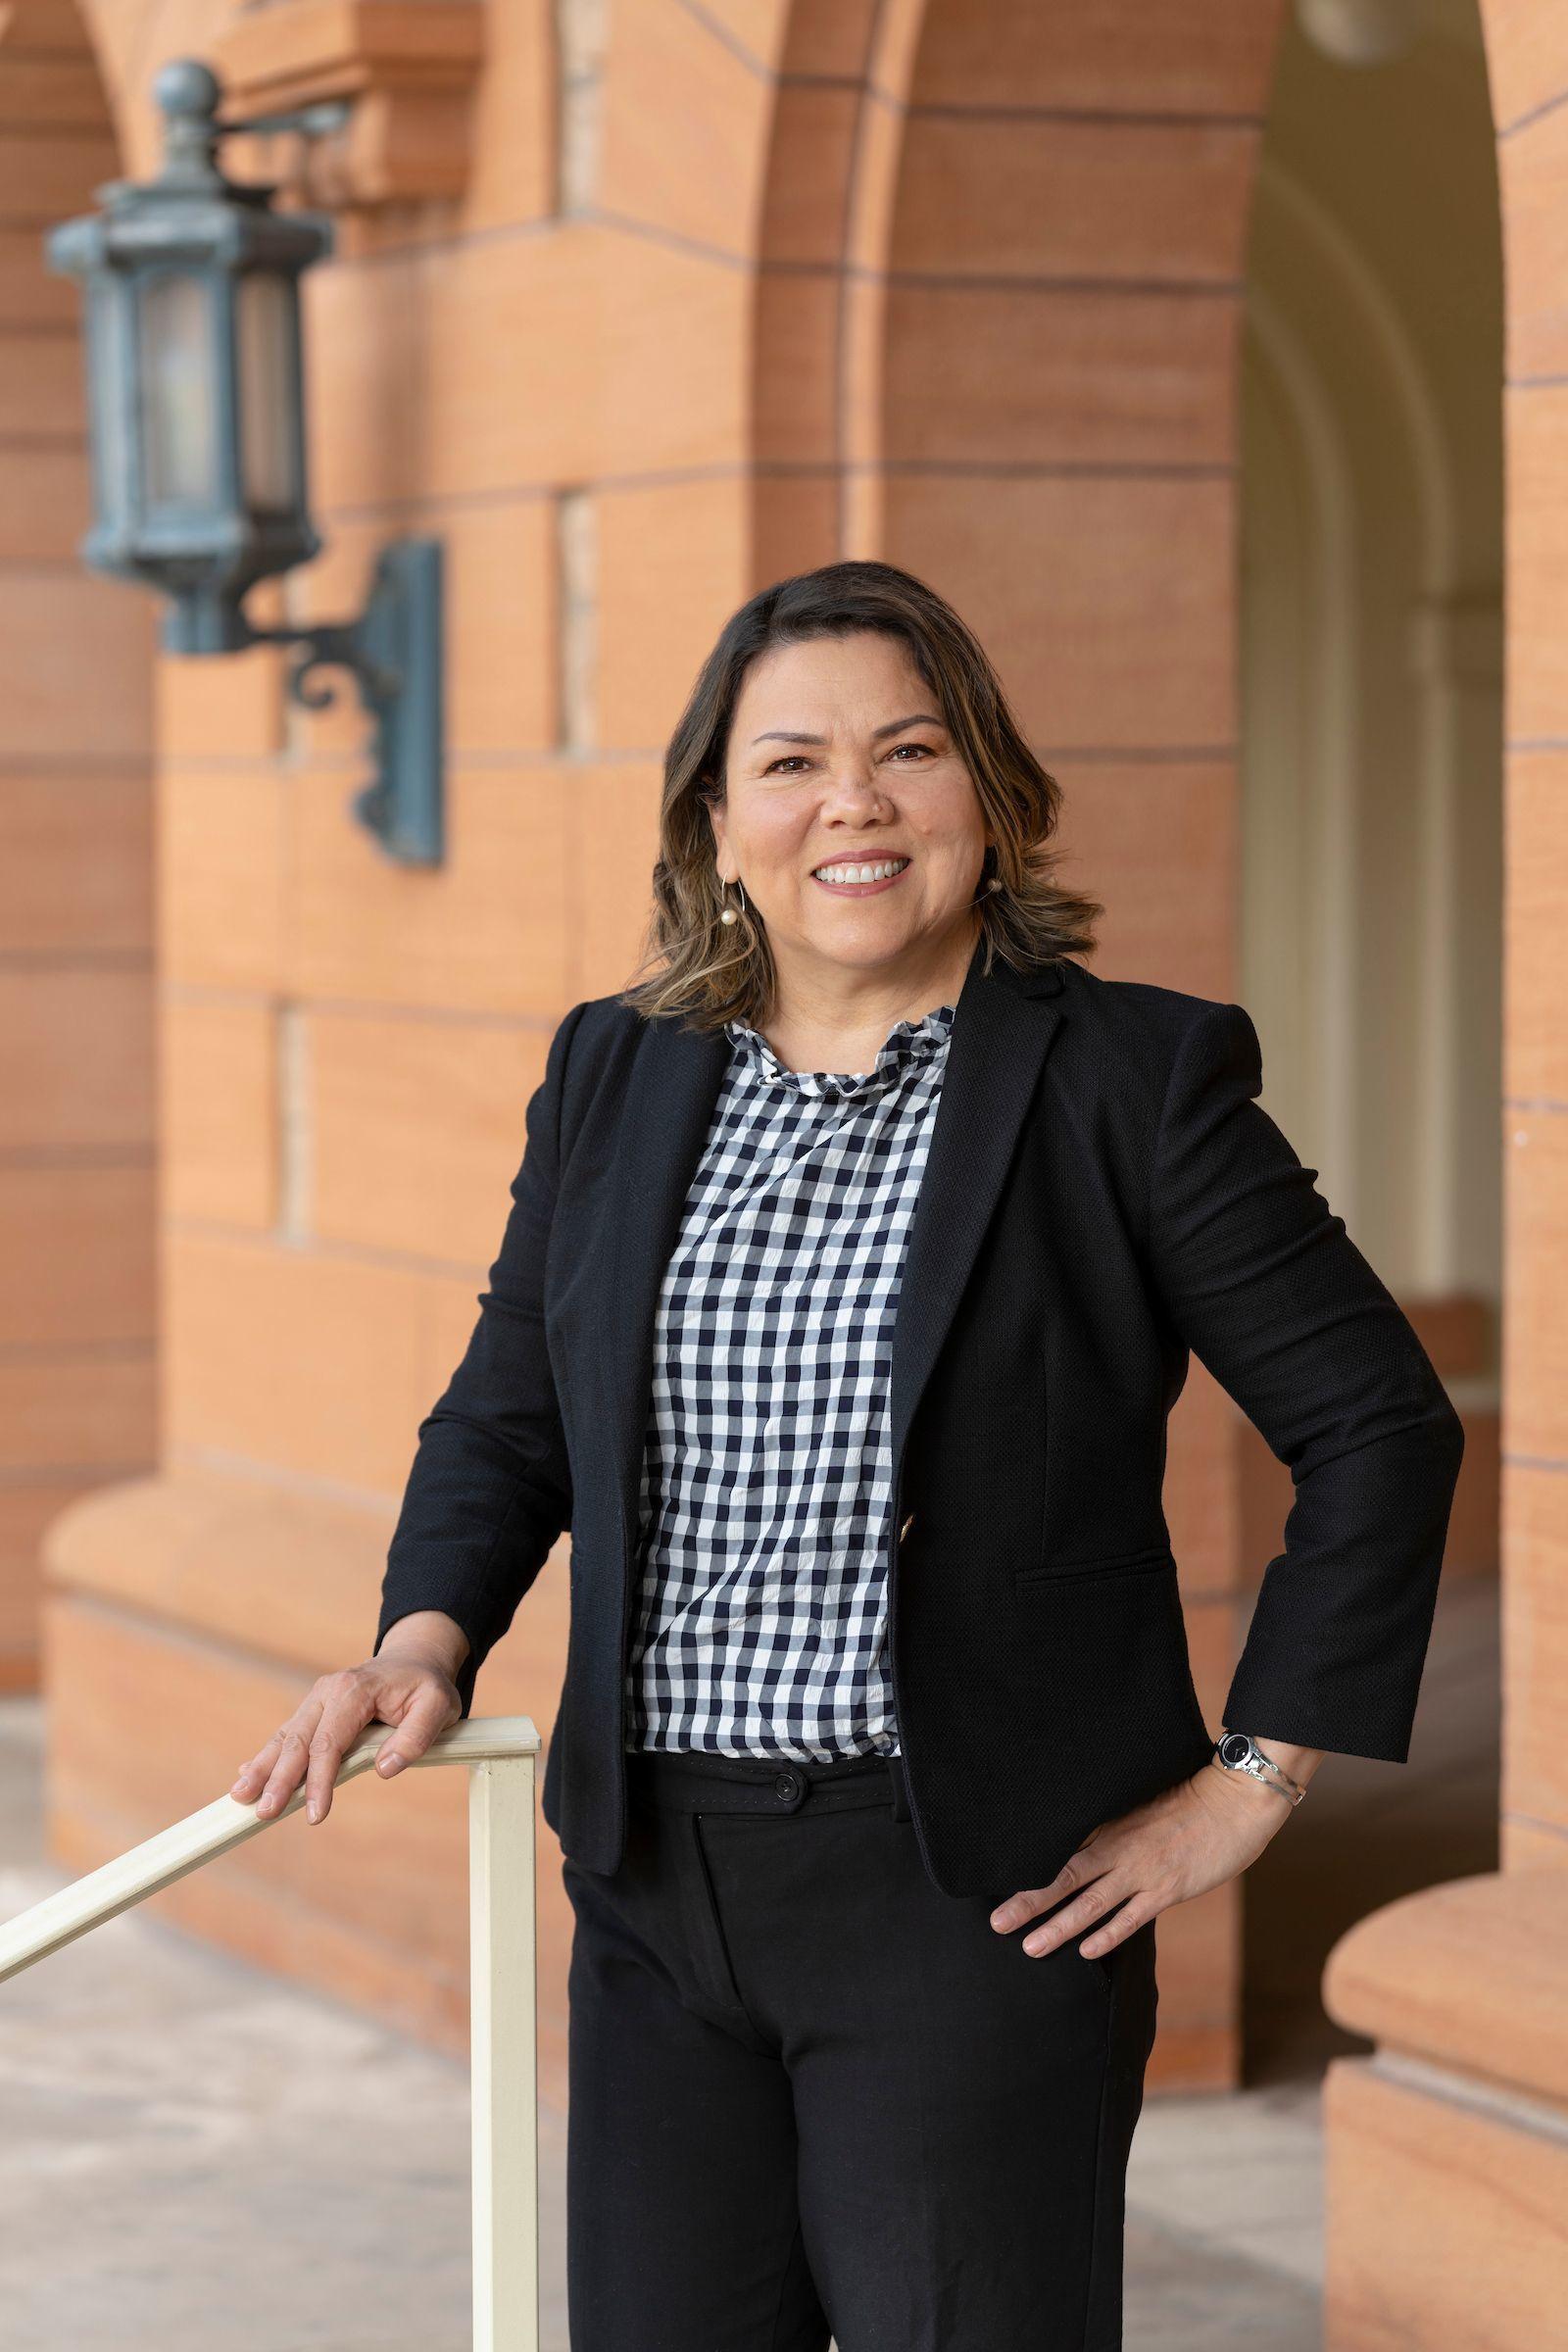 Maria Cordero, VP of People Services